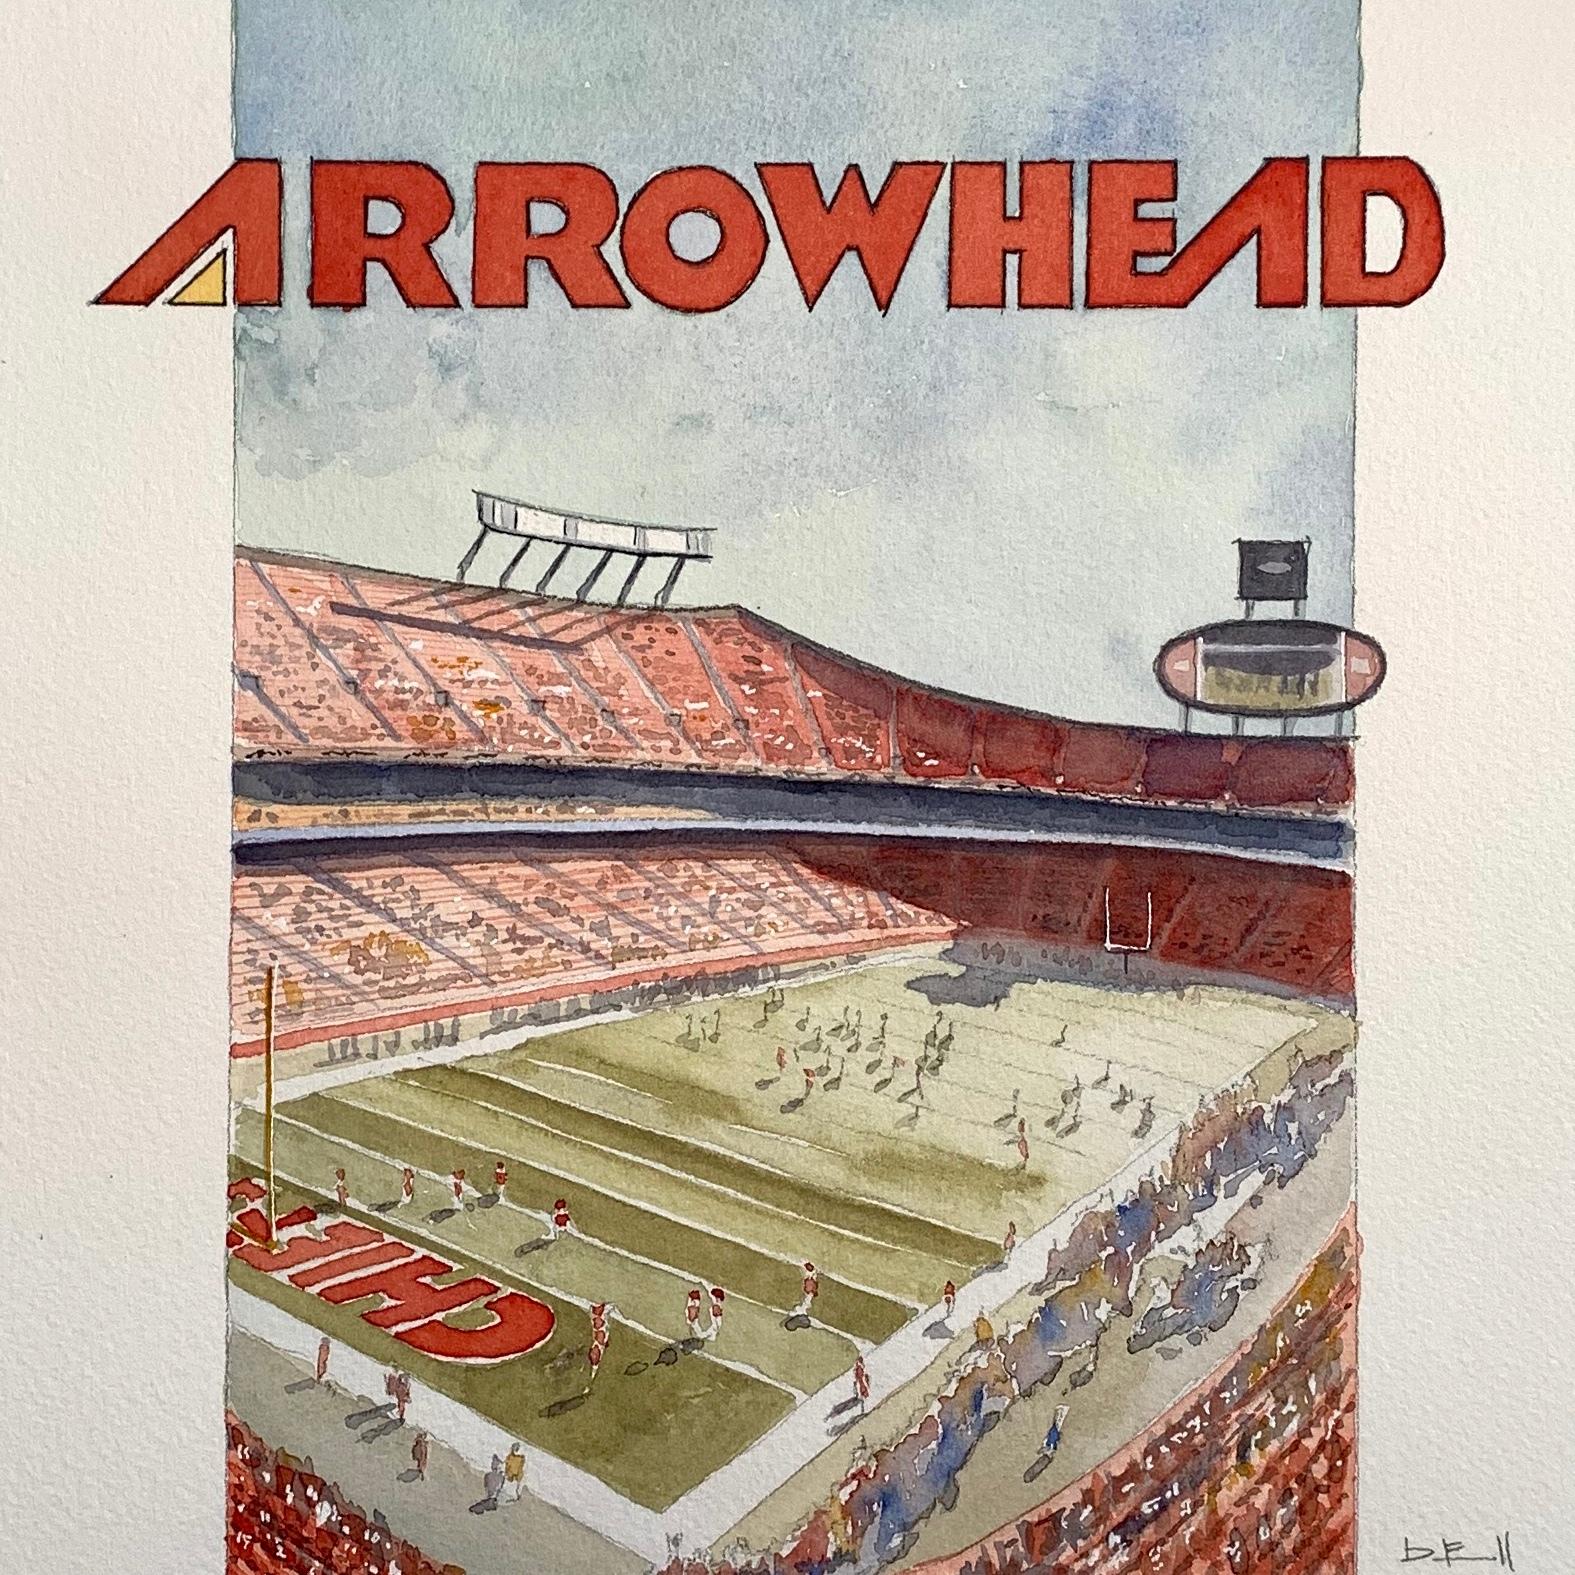 Arrowhead jyvkkx